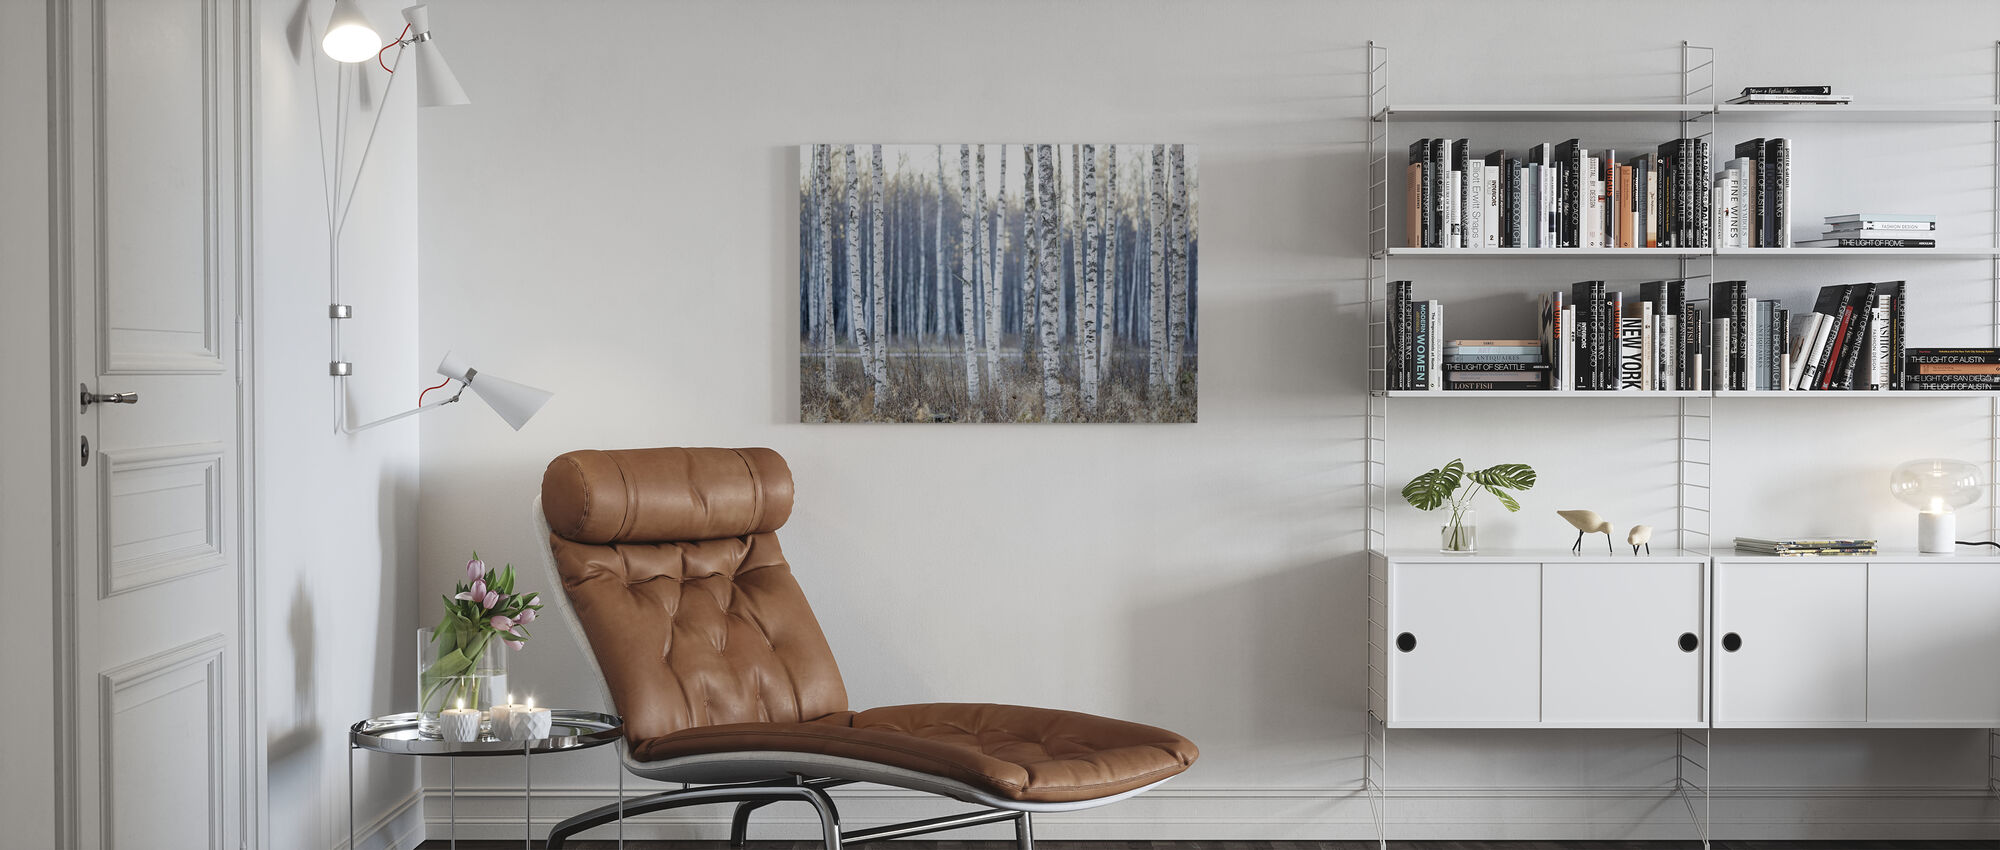 Birch Tree - Canvas print - Living Room